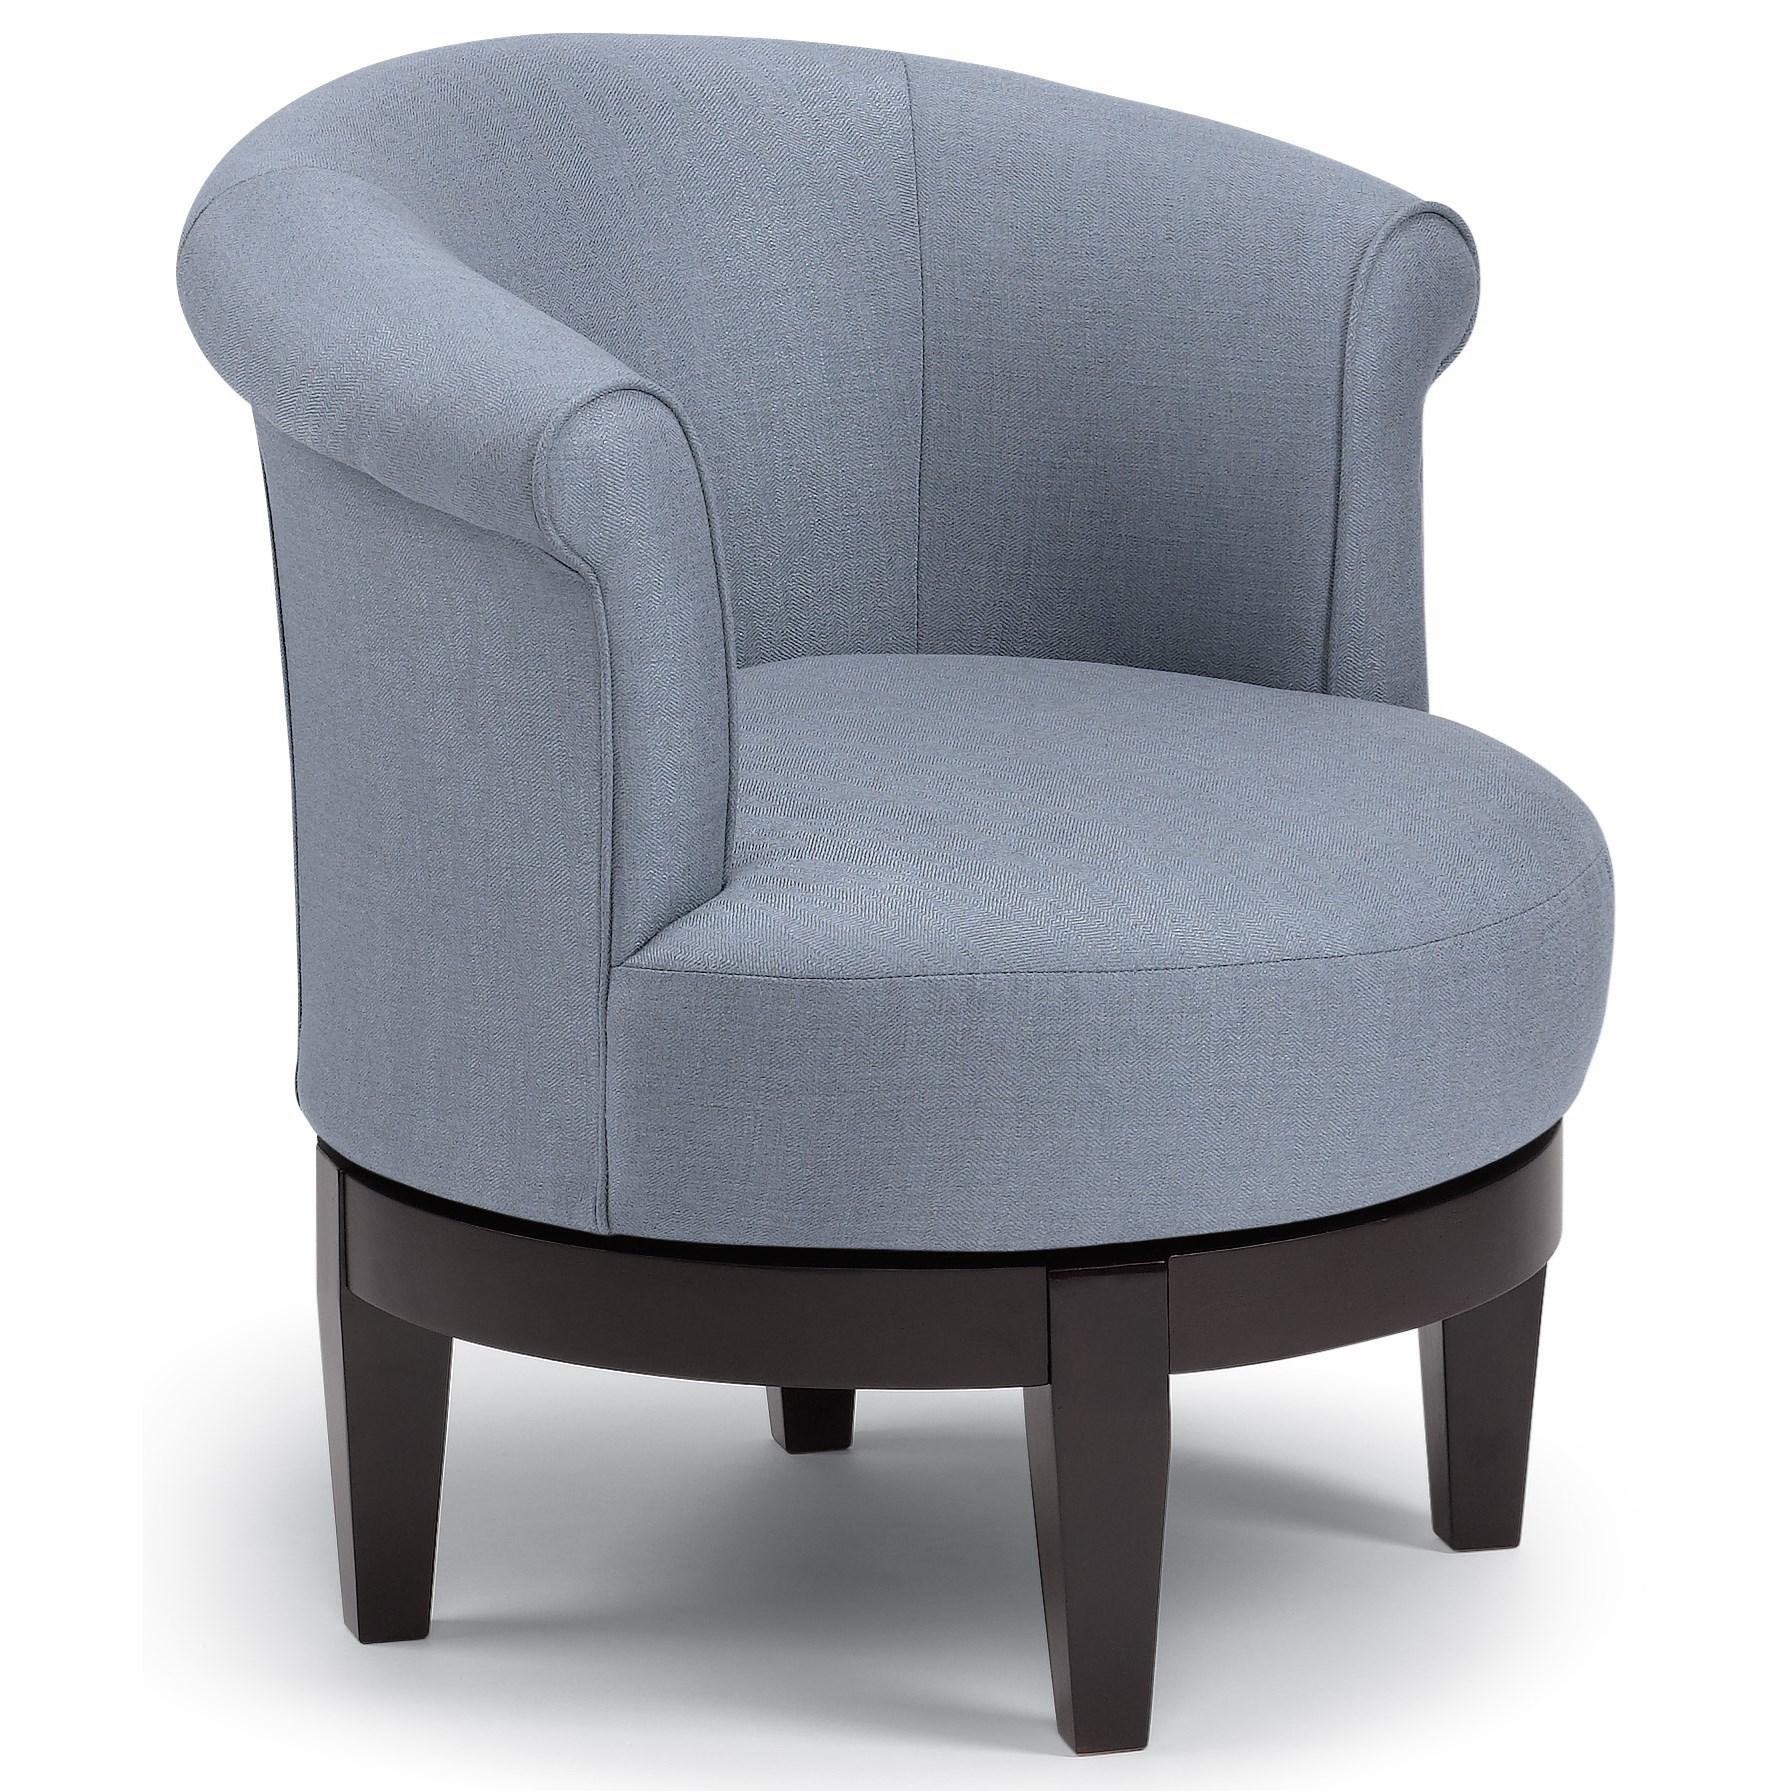 Best Home Furnishings Chairs  Swivel Barrel Chic Attica